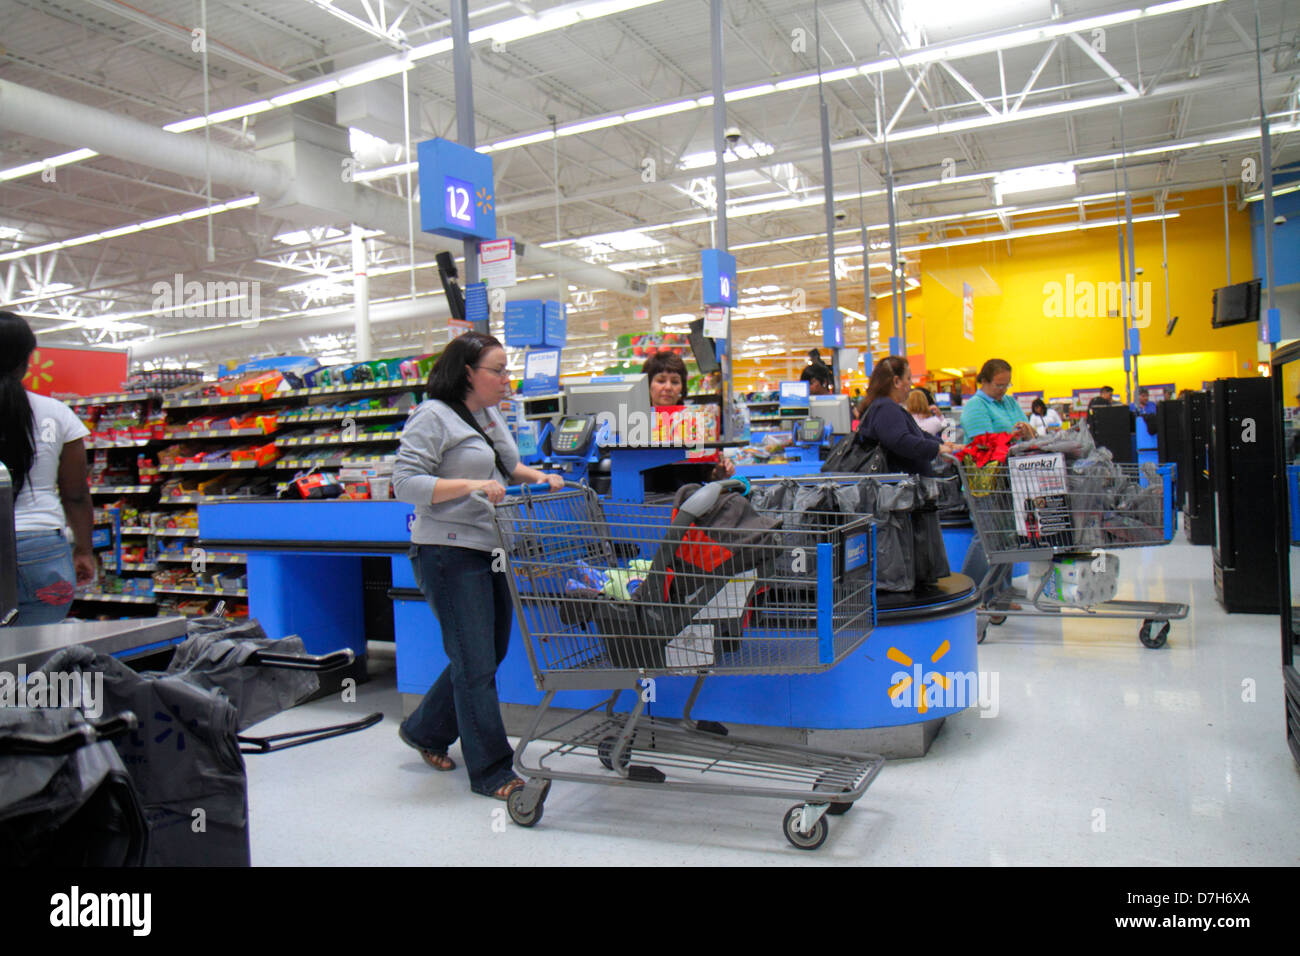 Miami Florida Wal-Mart Walmart discount shopping Abfahrt Linie Warteschlange Kassiererin Frau Warenkorb Kunde Stockfoto